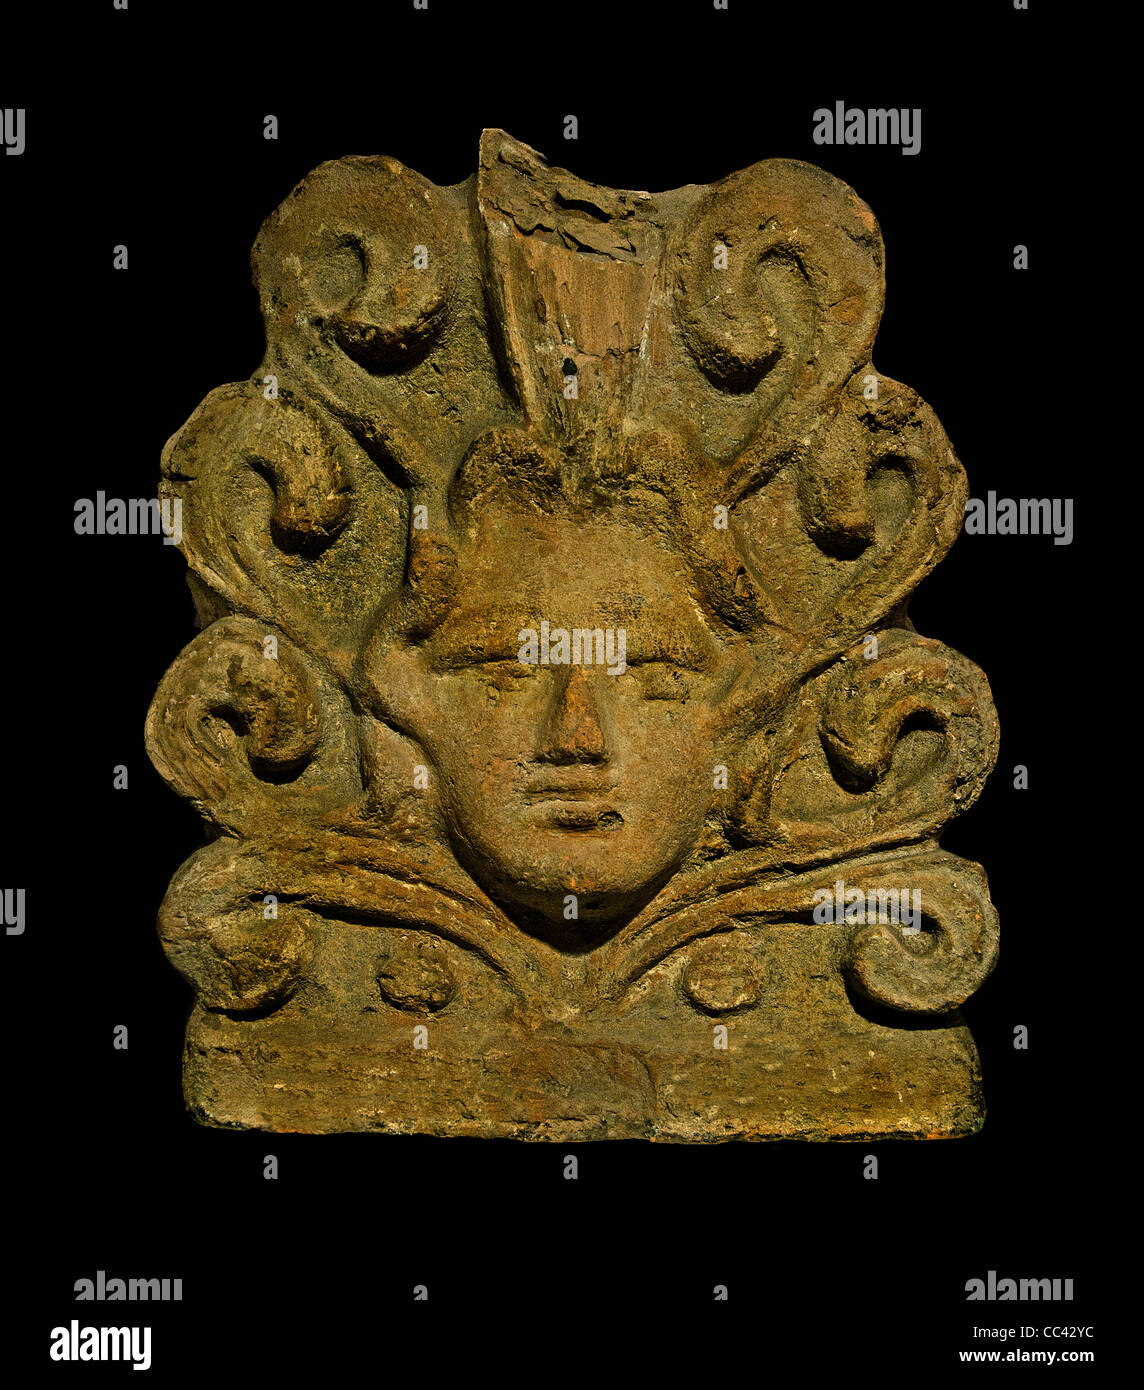 Gods demons monsters Terracotta Veii temple Apollo Portonaccio Etruscan Italy Etruria 600 - 450 BC - Stock Image